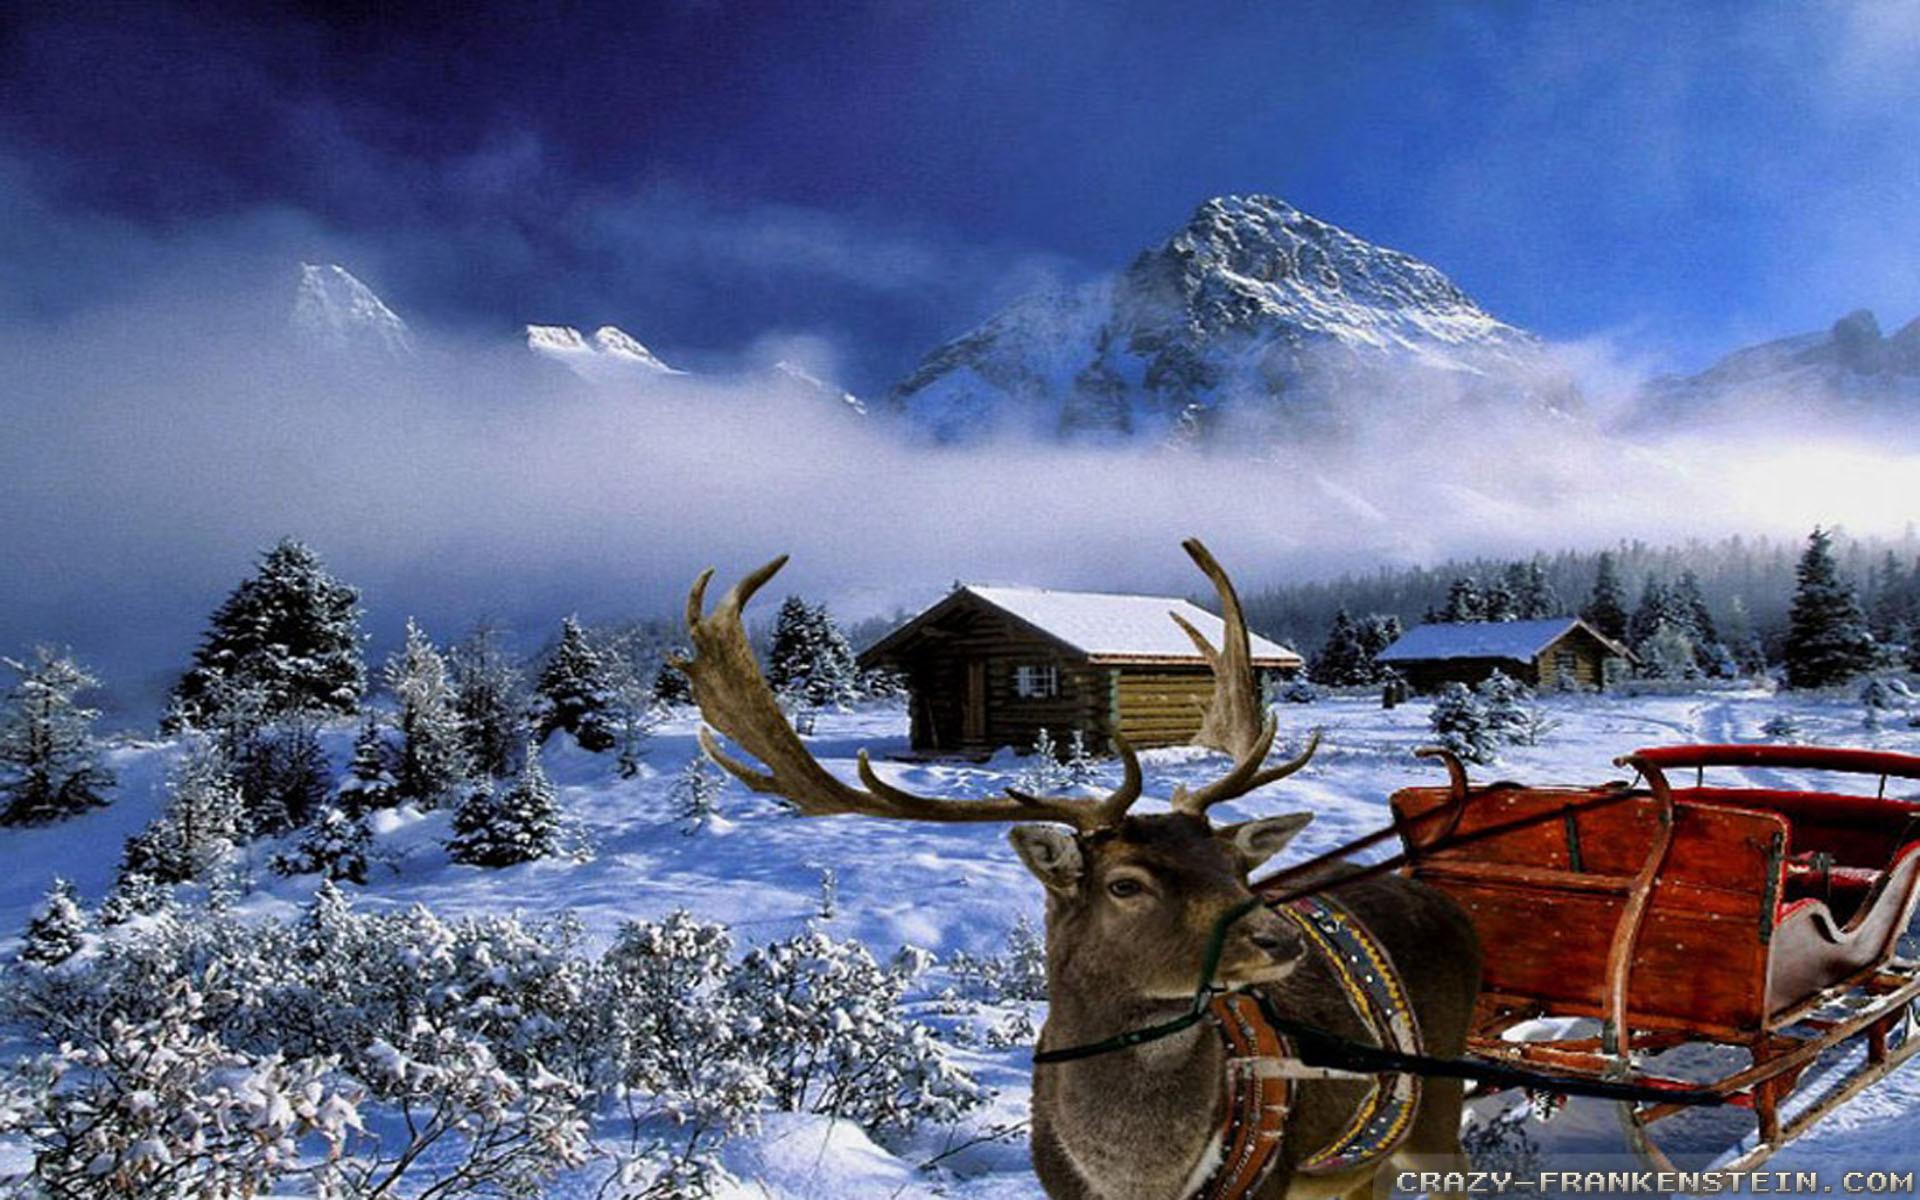 Wallpaper: Scene Winter Christmas wallpapers. Resolution: 1024×768    1280×1024   1600×1200. Widescreen Res: 1440×900   1680×1050   1920×1200